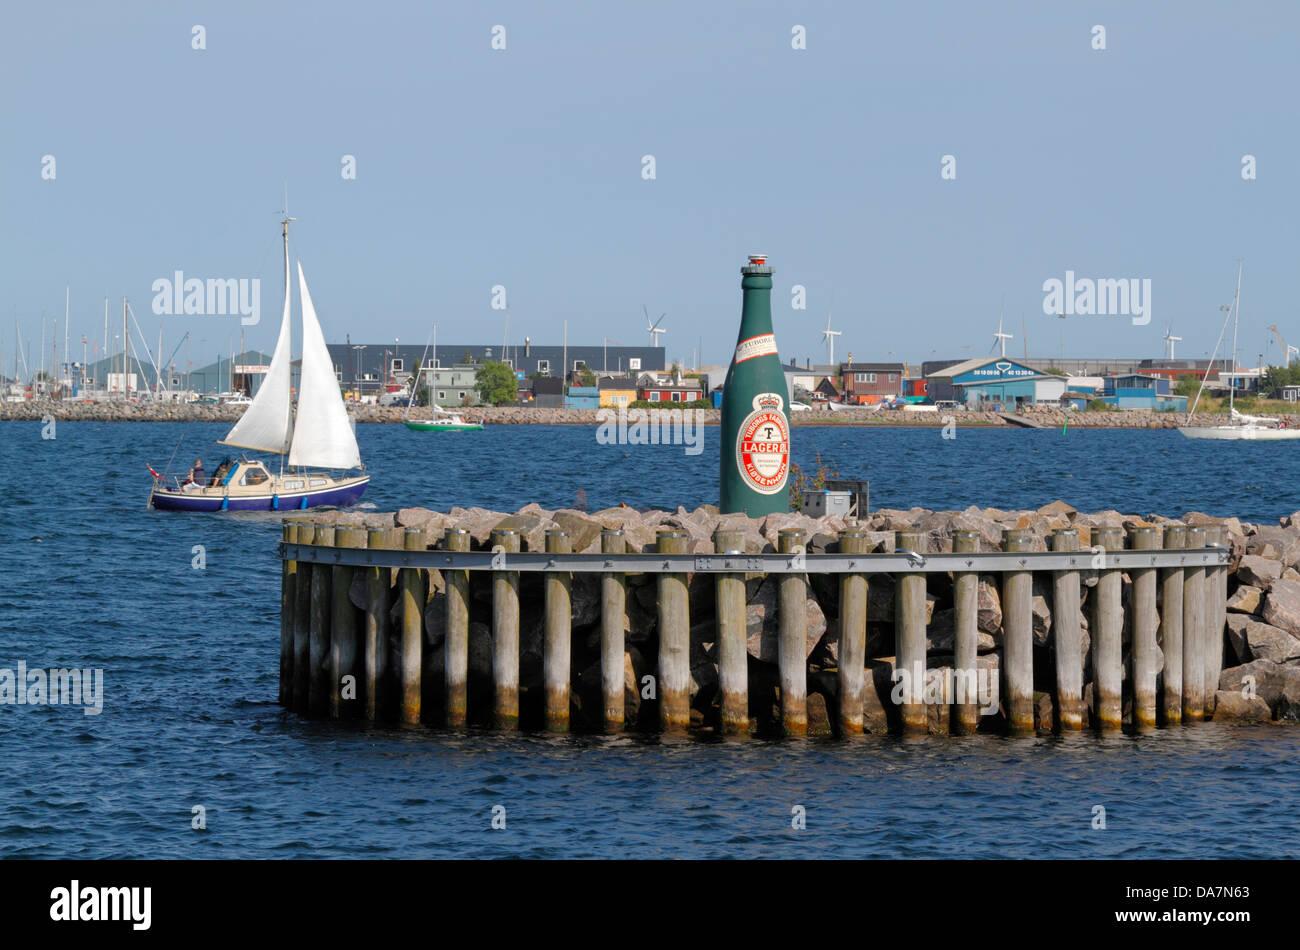 A sailboat passing the port harbour light of Tuborg Harbour, a red labelled Tuborg bottle, Copenhagen North Harbour. - Stock Image